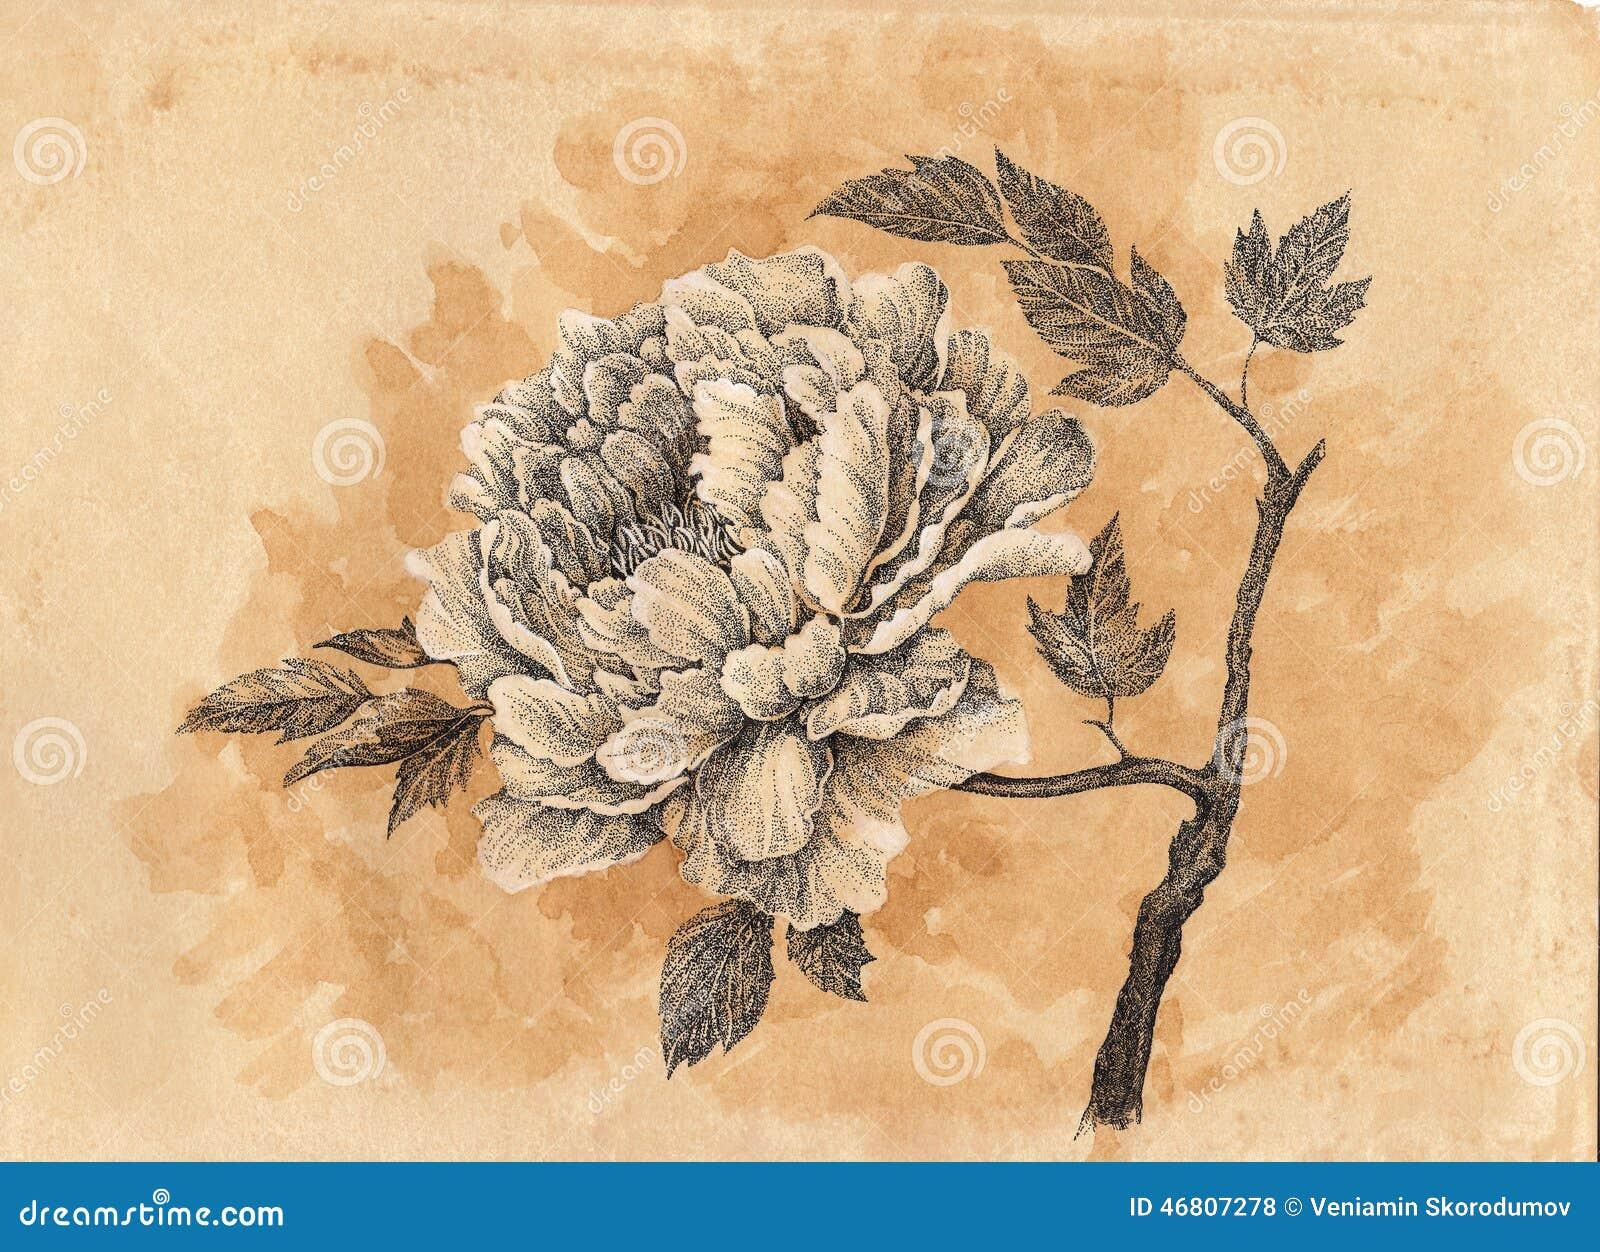 Dessin la main cardez fleur de pivoine illustration stock image 46807278 - Dessin de la main ...